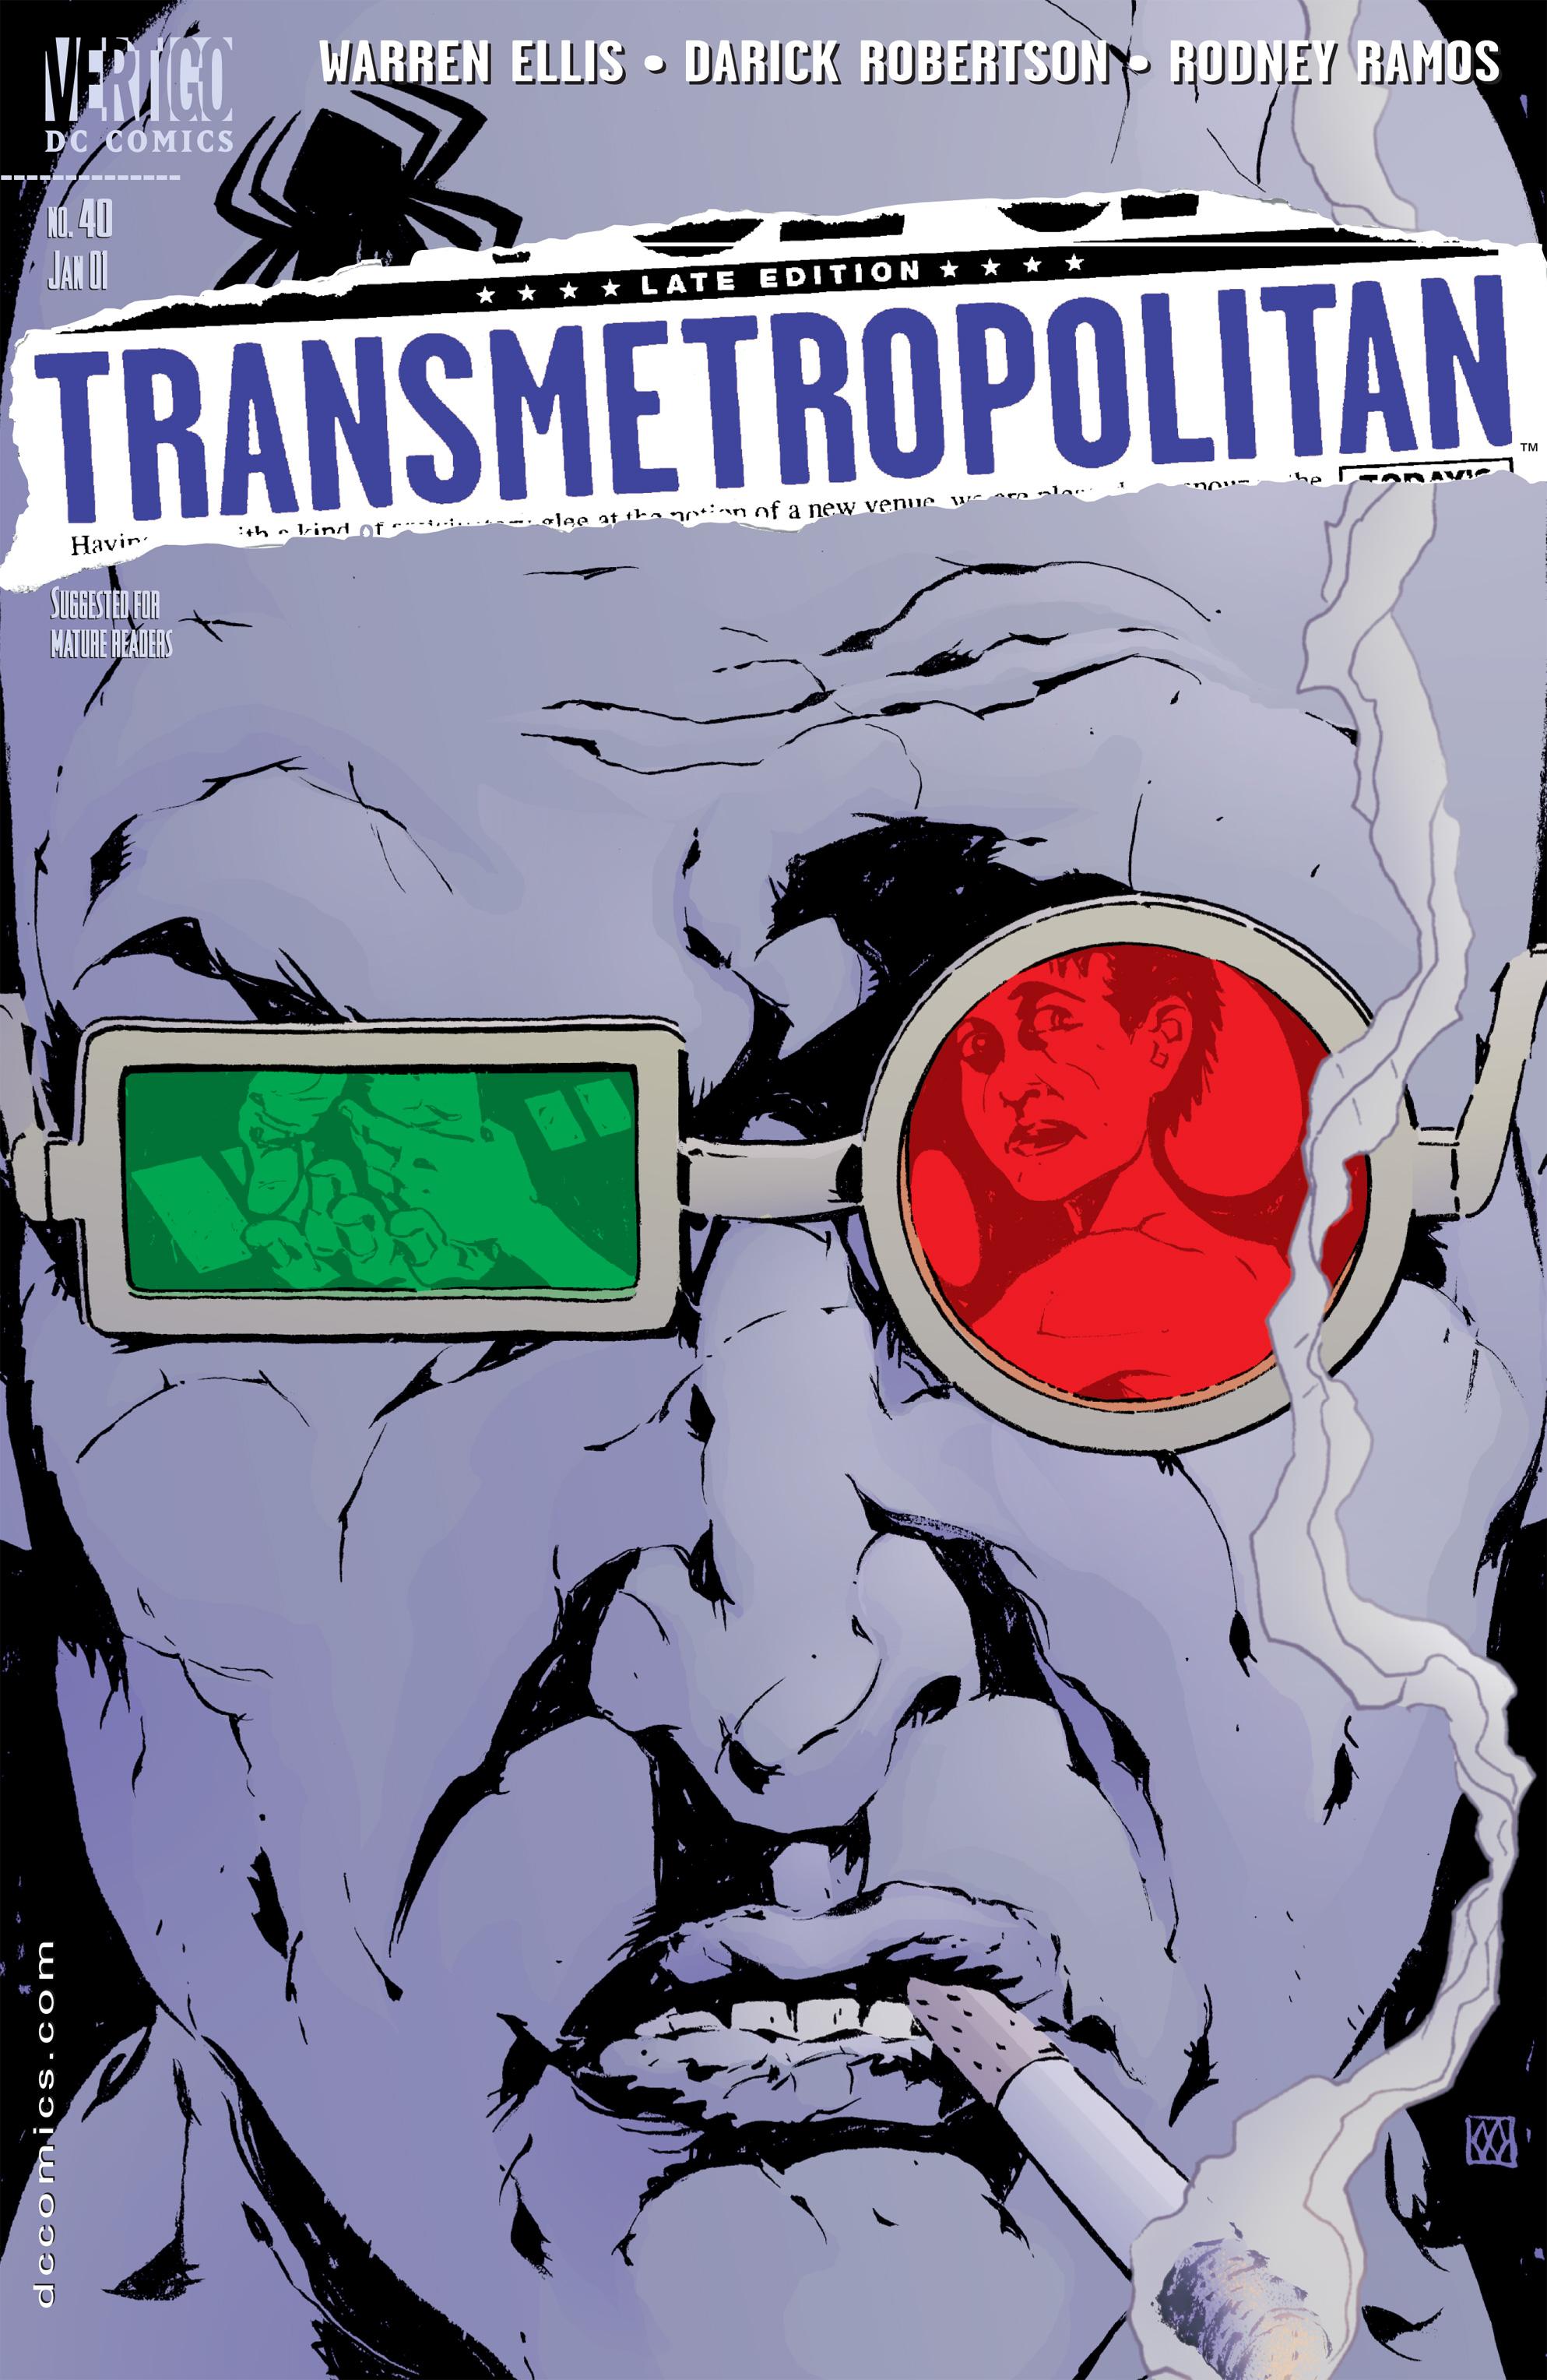 Read online Transmetropolitan comic -  Issue #40 - 1